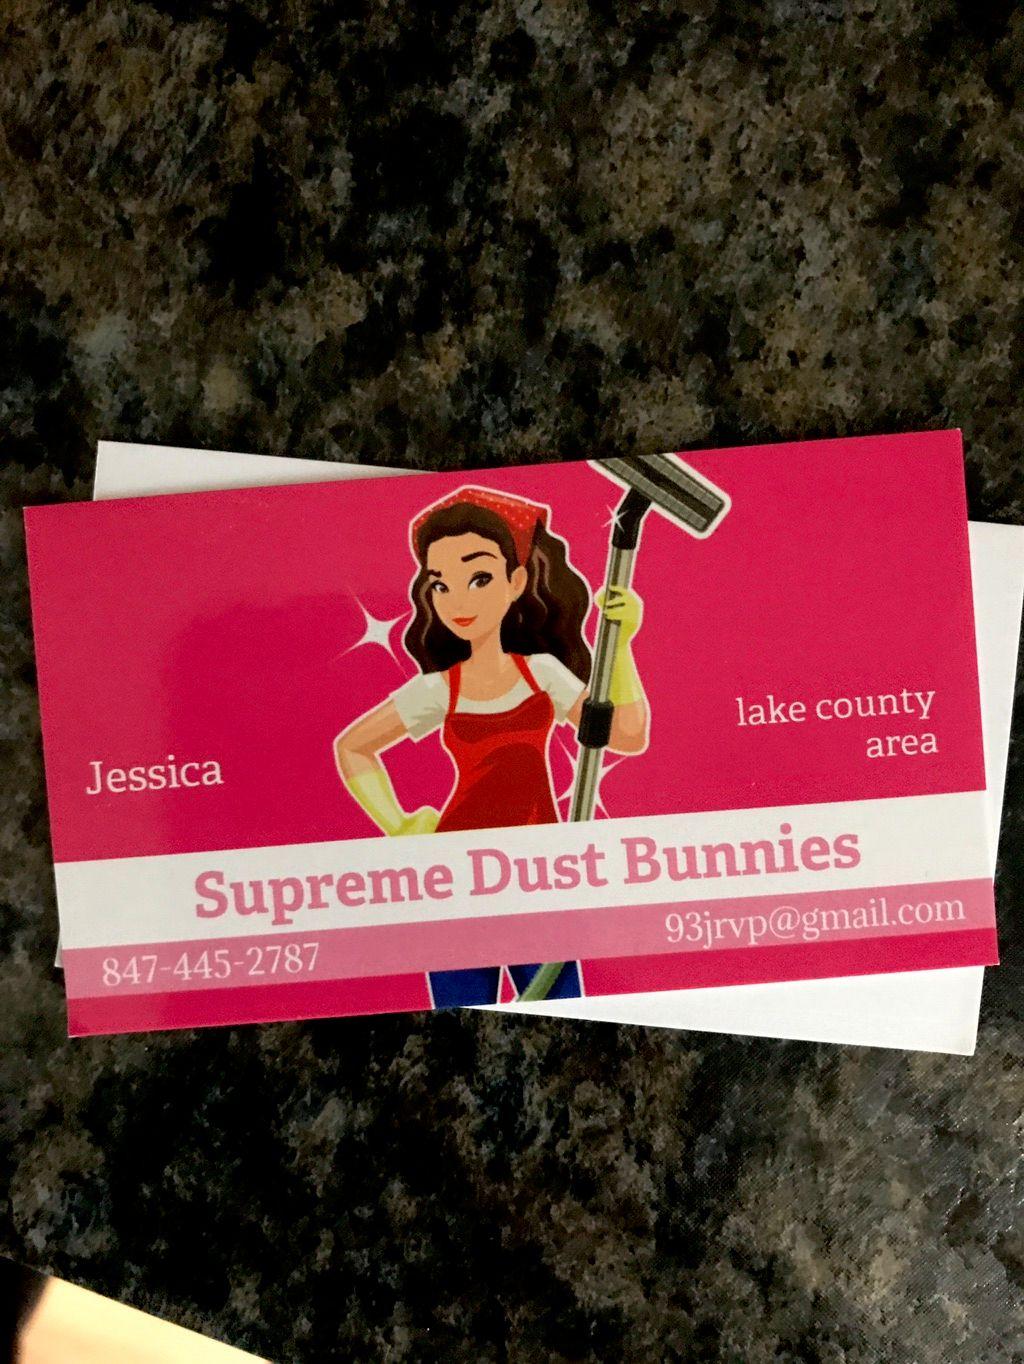 Supreme dust bunnies